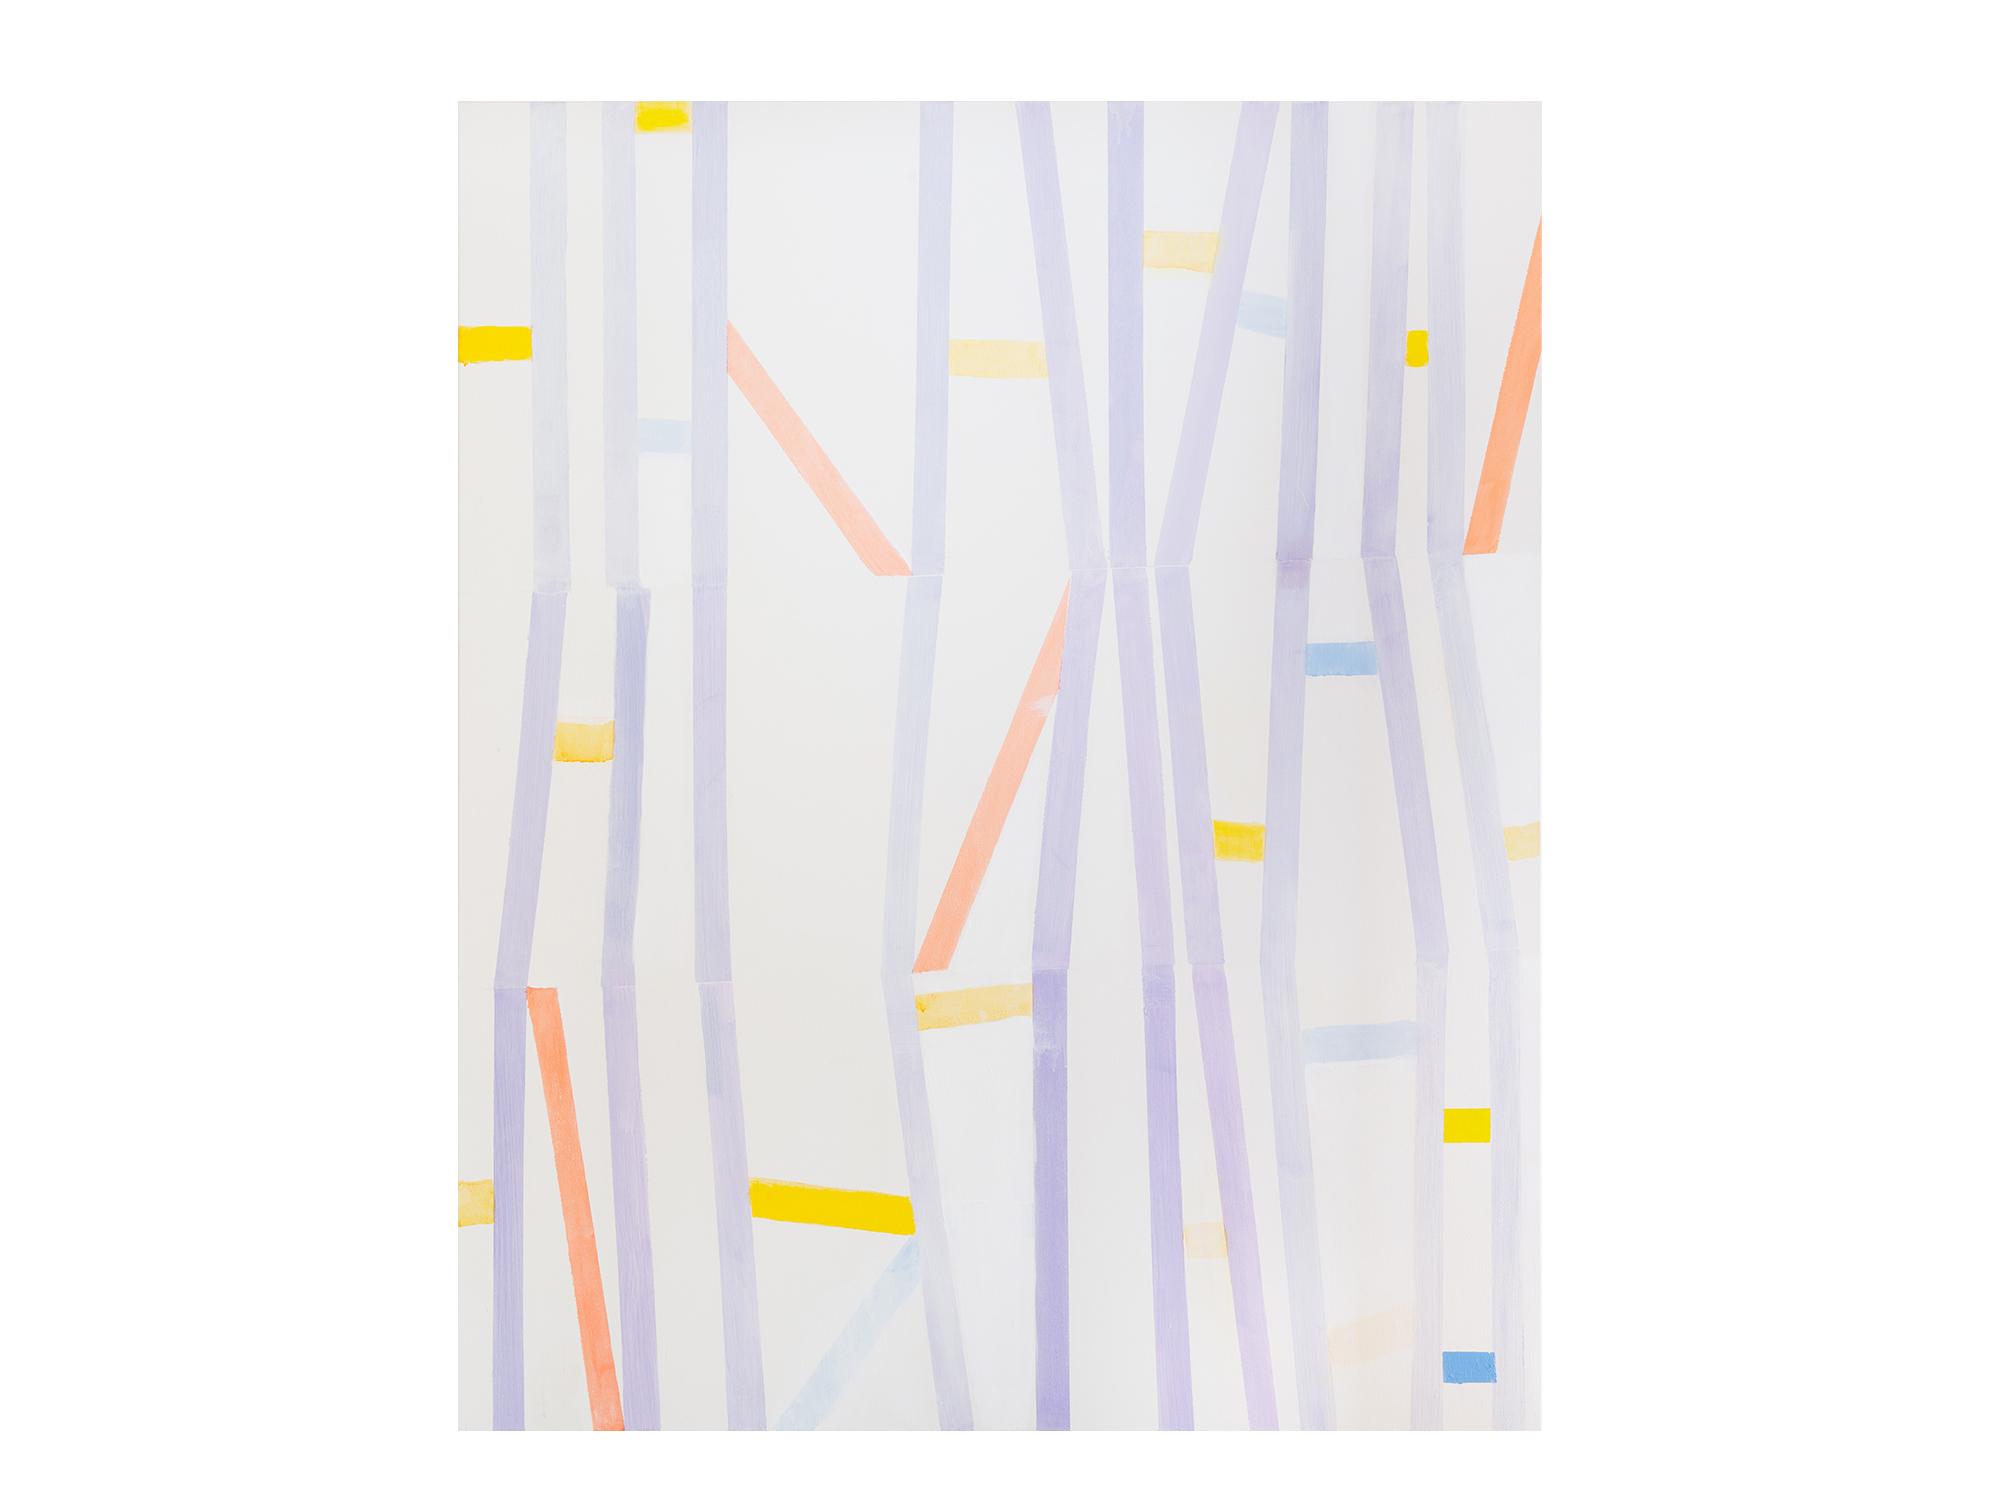 Antonia Sellbach   Kinetic Conversation 1, 2018 acrylic on linen 137 x 112cm